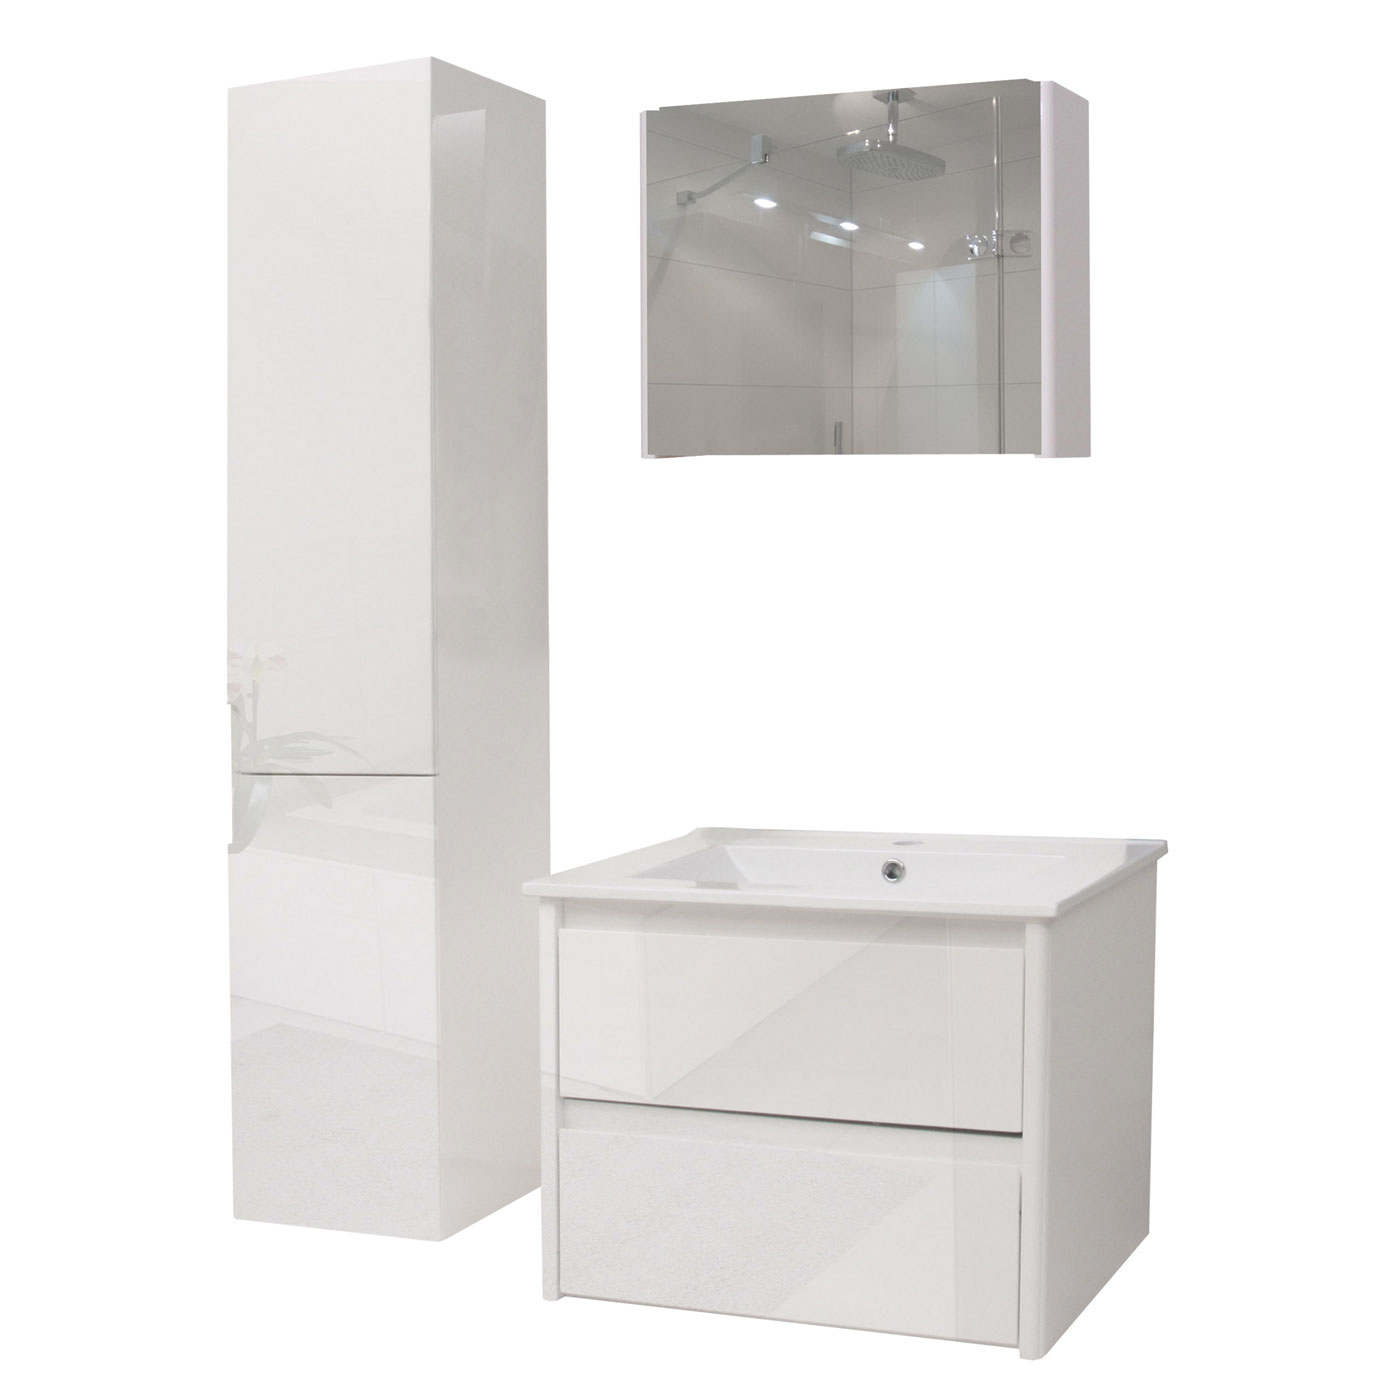 Badezimmerset hwc b19 waschtisch spiegelschrank for H ngeschrank hochglanz